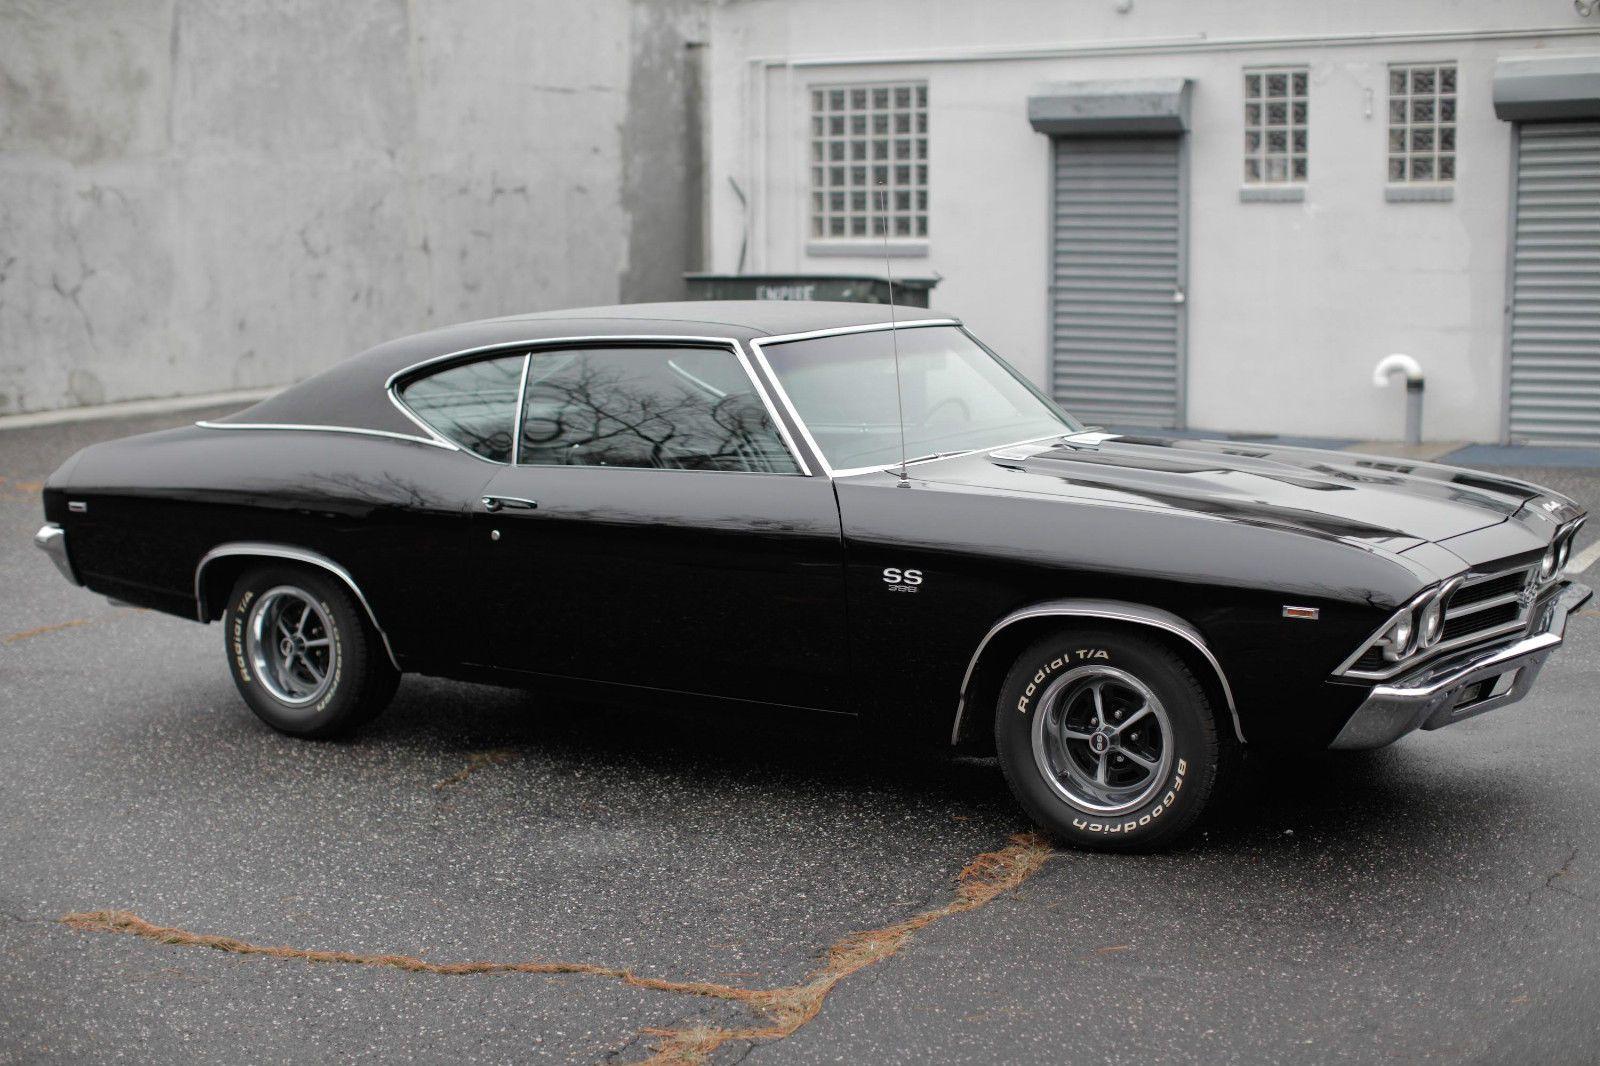 Garage Find 1970 Chevelle Ss 396 350 Horsepower 1 Owner